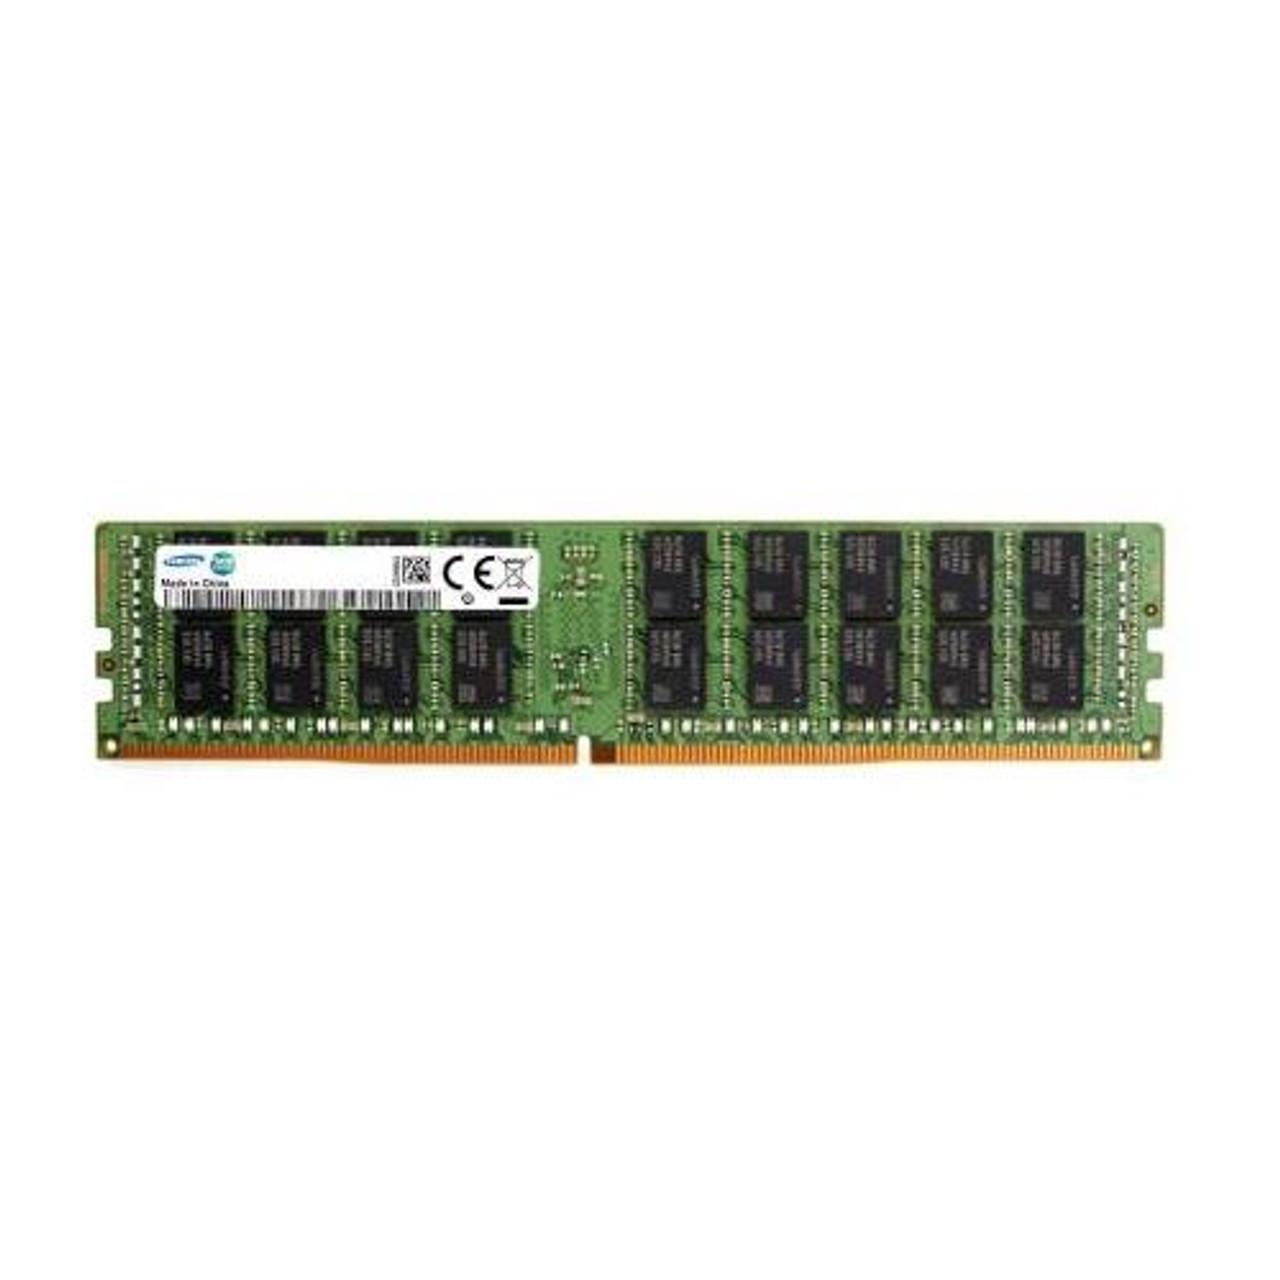 Samsung 16GB DDR4 2133MHz ECC REG PC4-17000 Server Memory M393A2G40DB0-CPB New